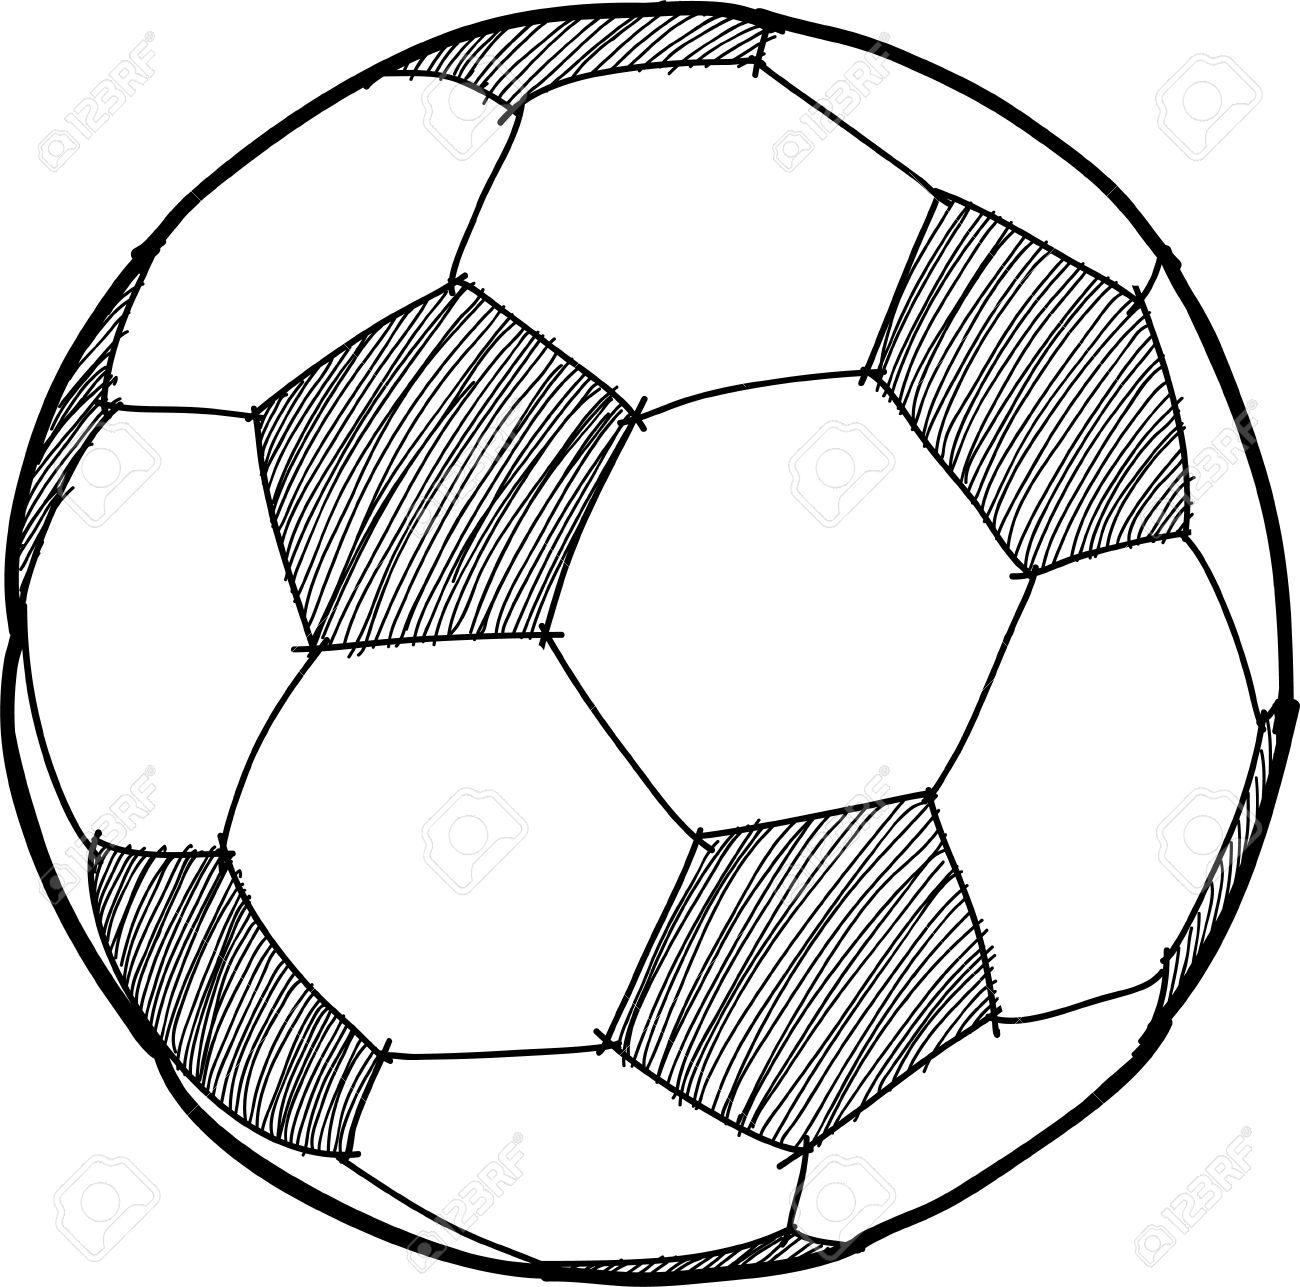 1300x1287 Soccerball Cartoon Royalty Free Cliparts, Vectors, And Stock